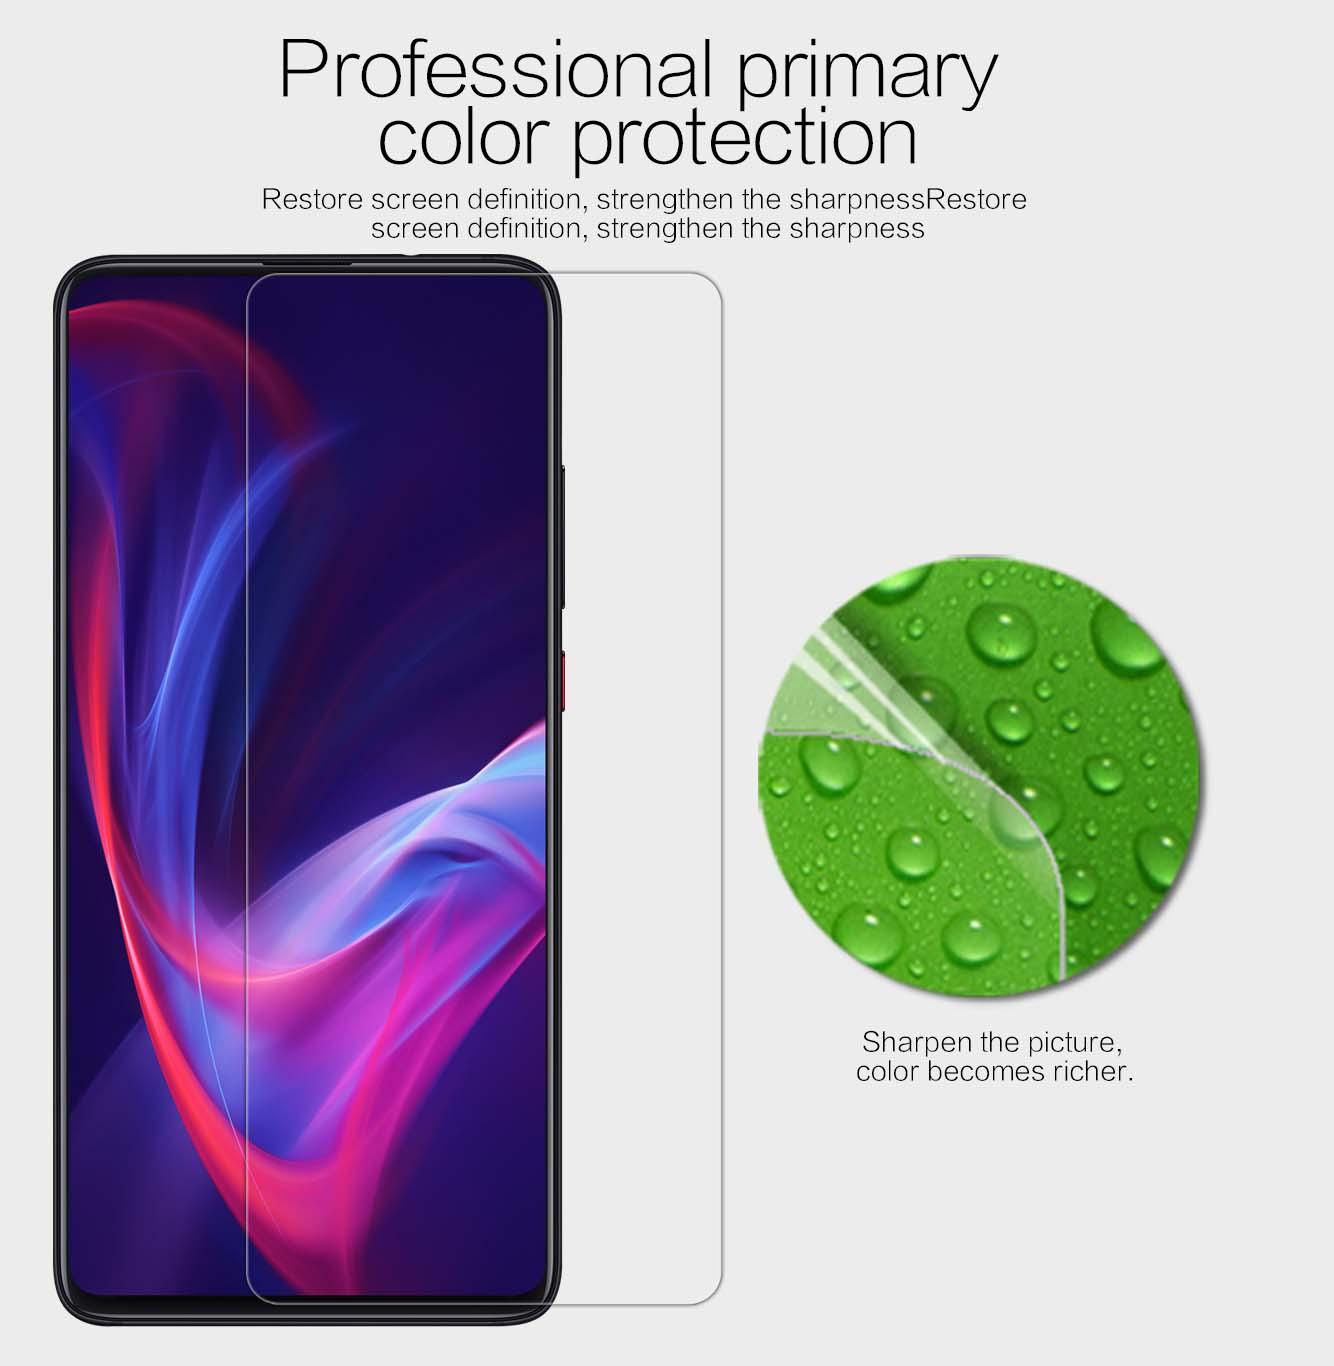 Xiaomi Redmi K20 screen protector